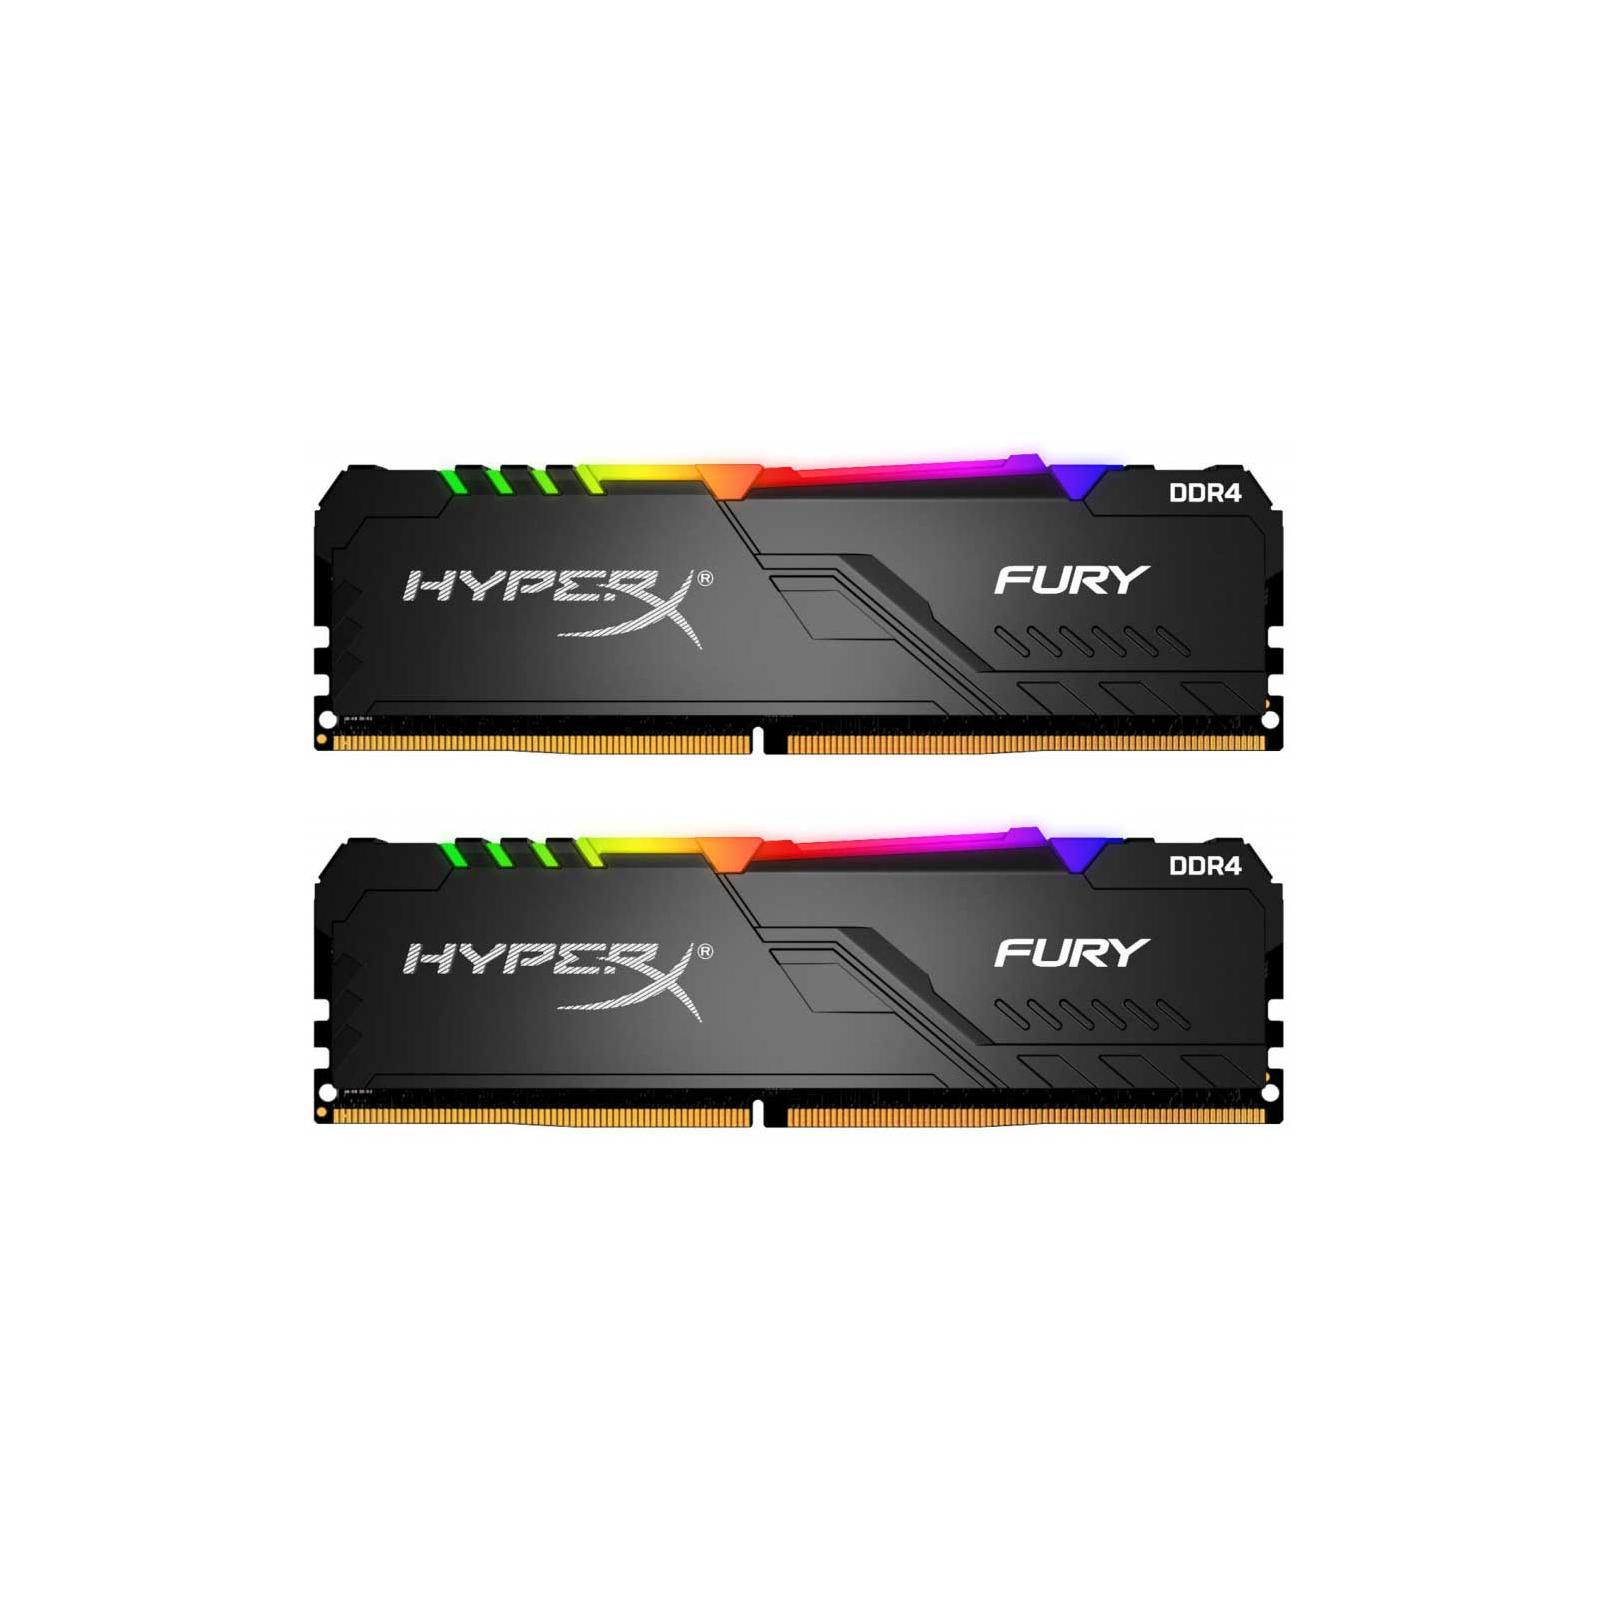 Модуль памяти для компьютера DDR4 32GB (2x16GB) 3000 MHz HyperX FURY RGB HyperX (Kingston Fury) (HX430C15FB3AK2/32)